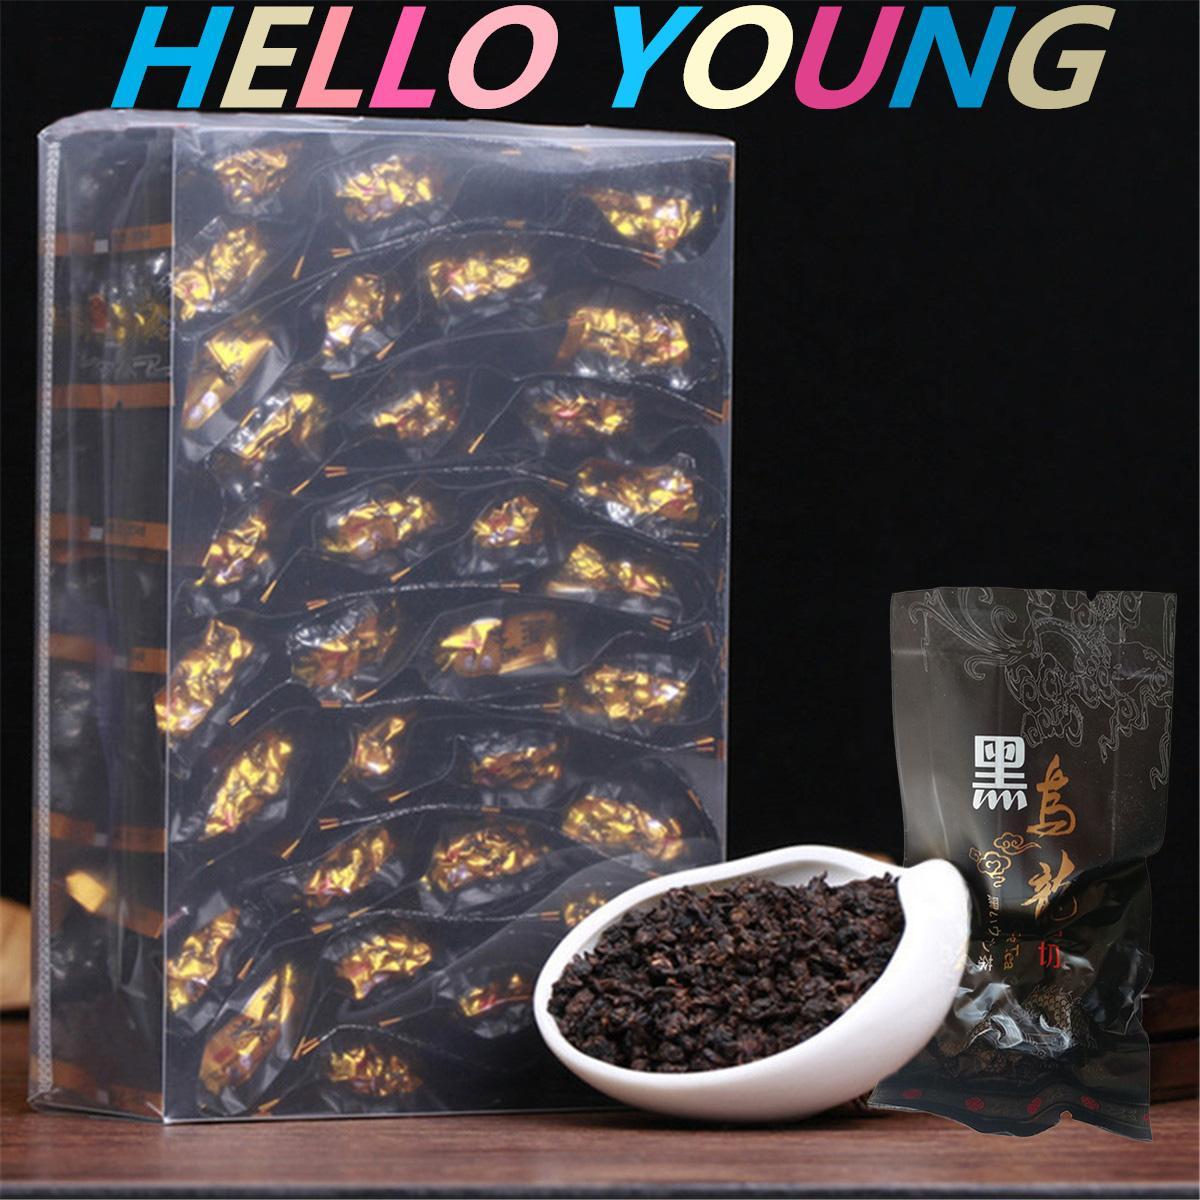 250g Çin Organik Siyah Oolong Çay Fırında Tieguanyin Yeşil Çay Yeni Bahar Çay Sağlıklı Yeşil Gıda Sıcak satış